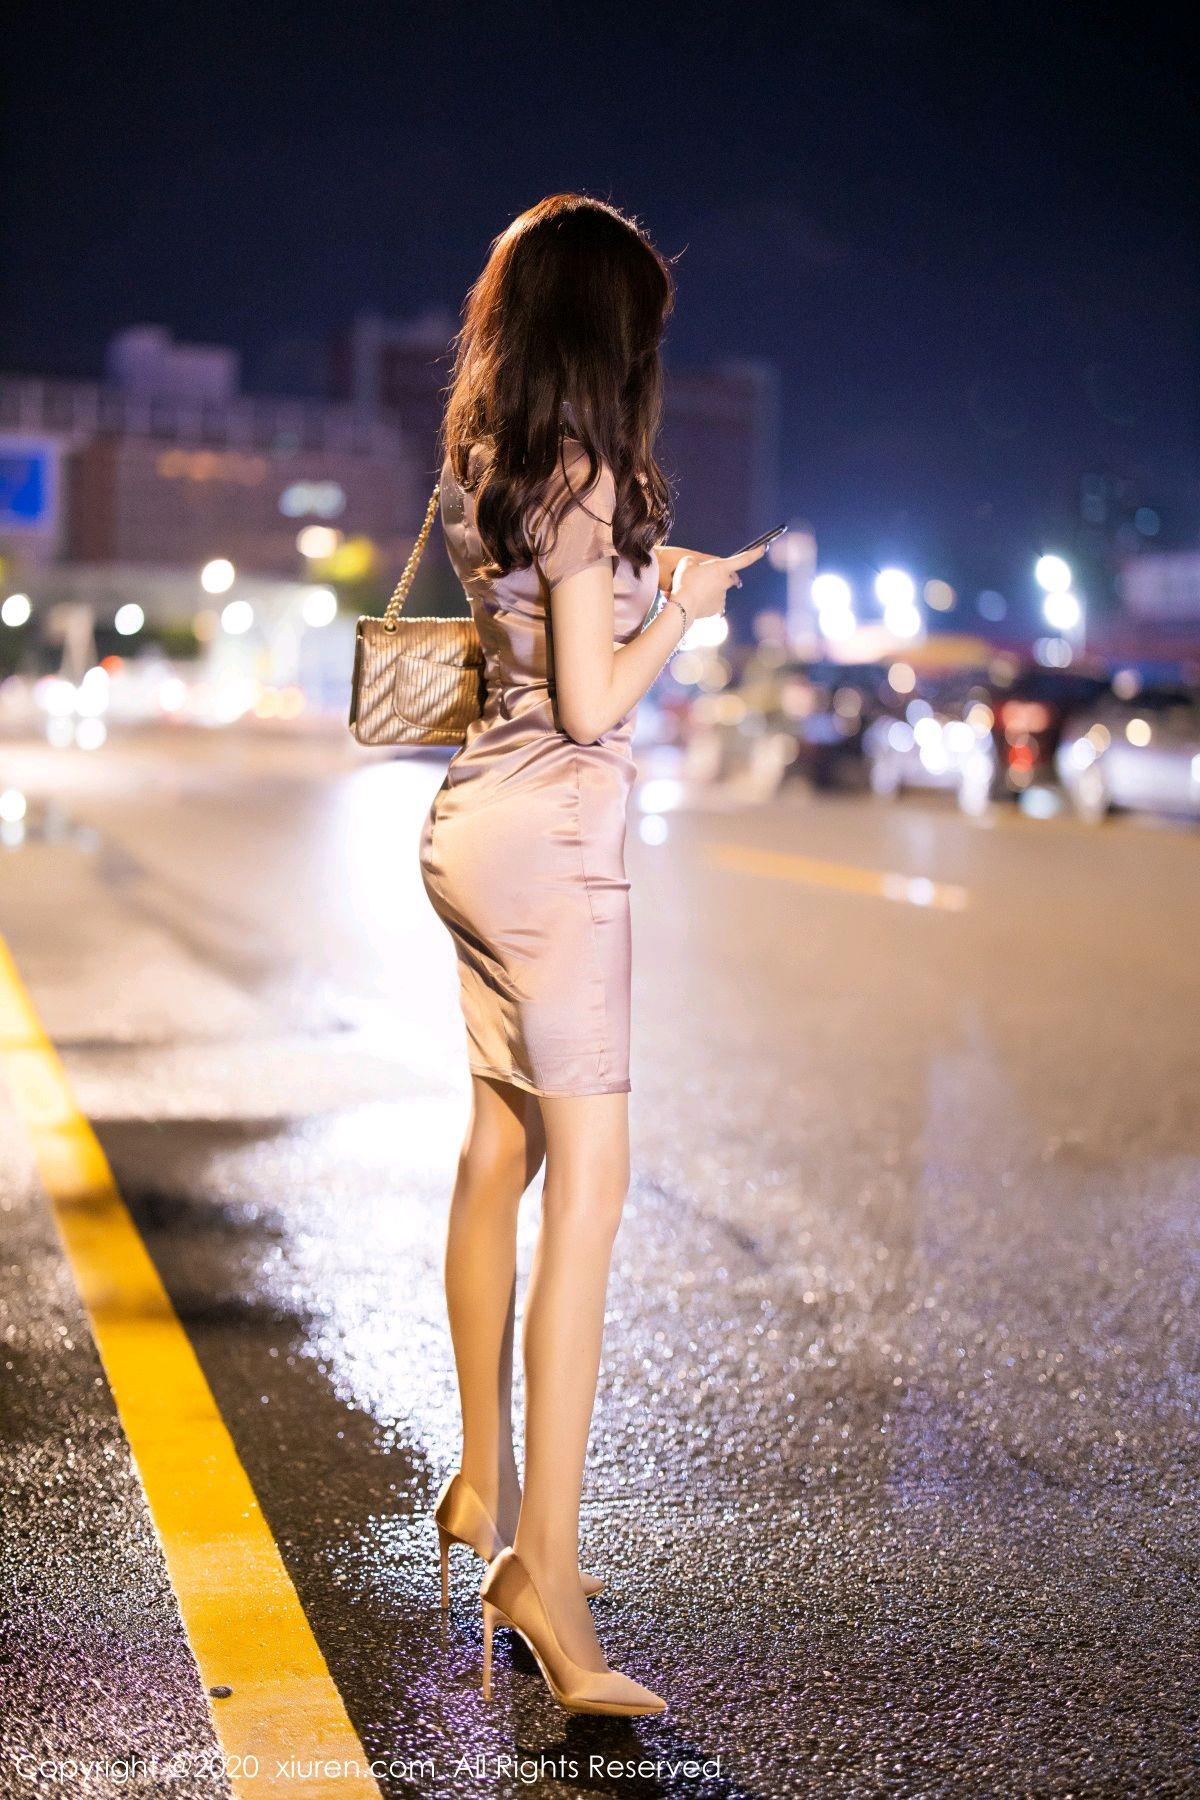 [XiuRen] Vol.2587 Yang Chen Chen 12P, Underwear, Xiuren, Yang Chen Chen